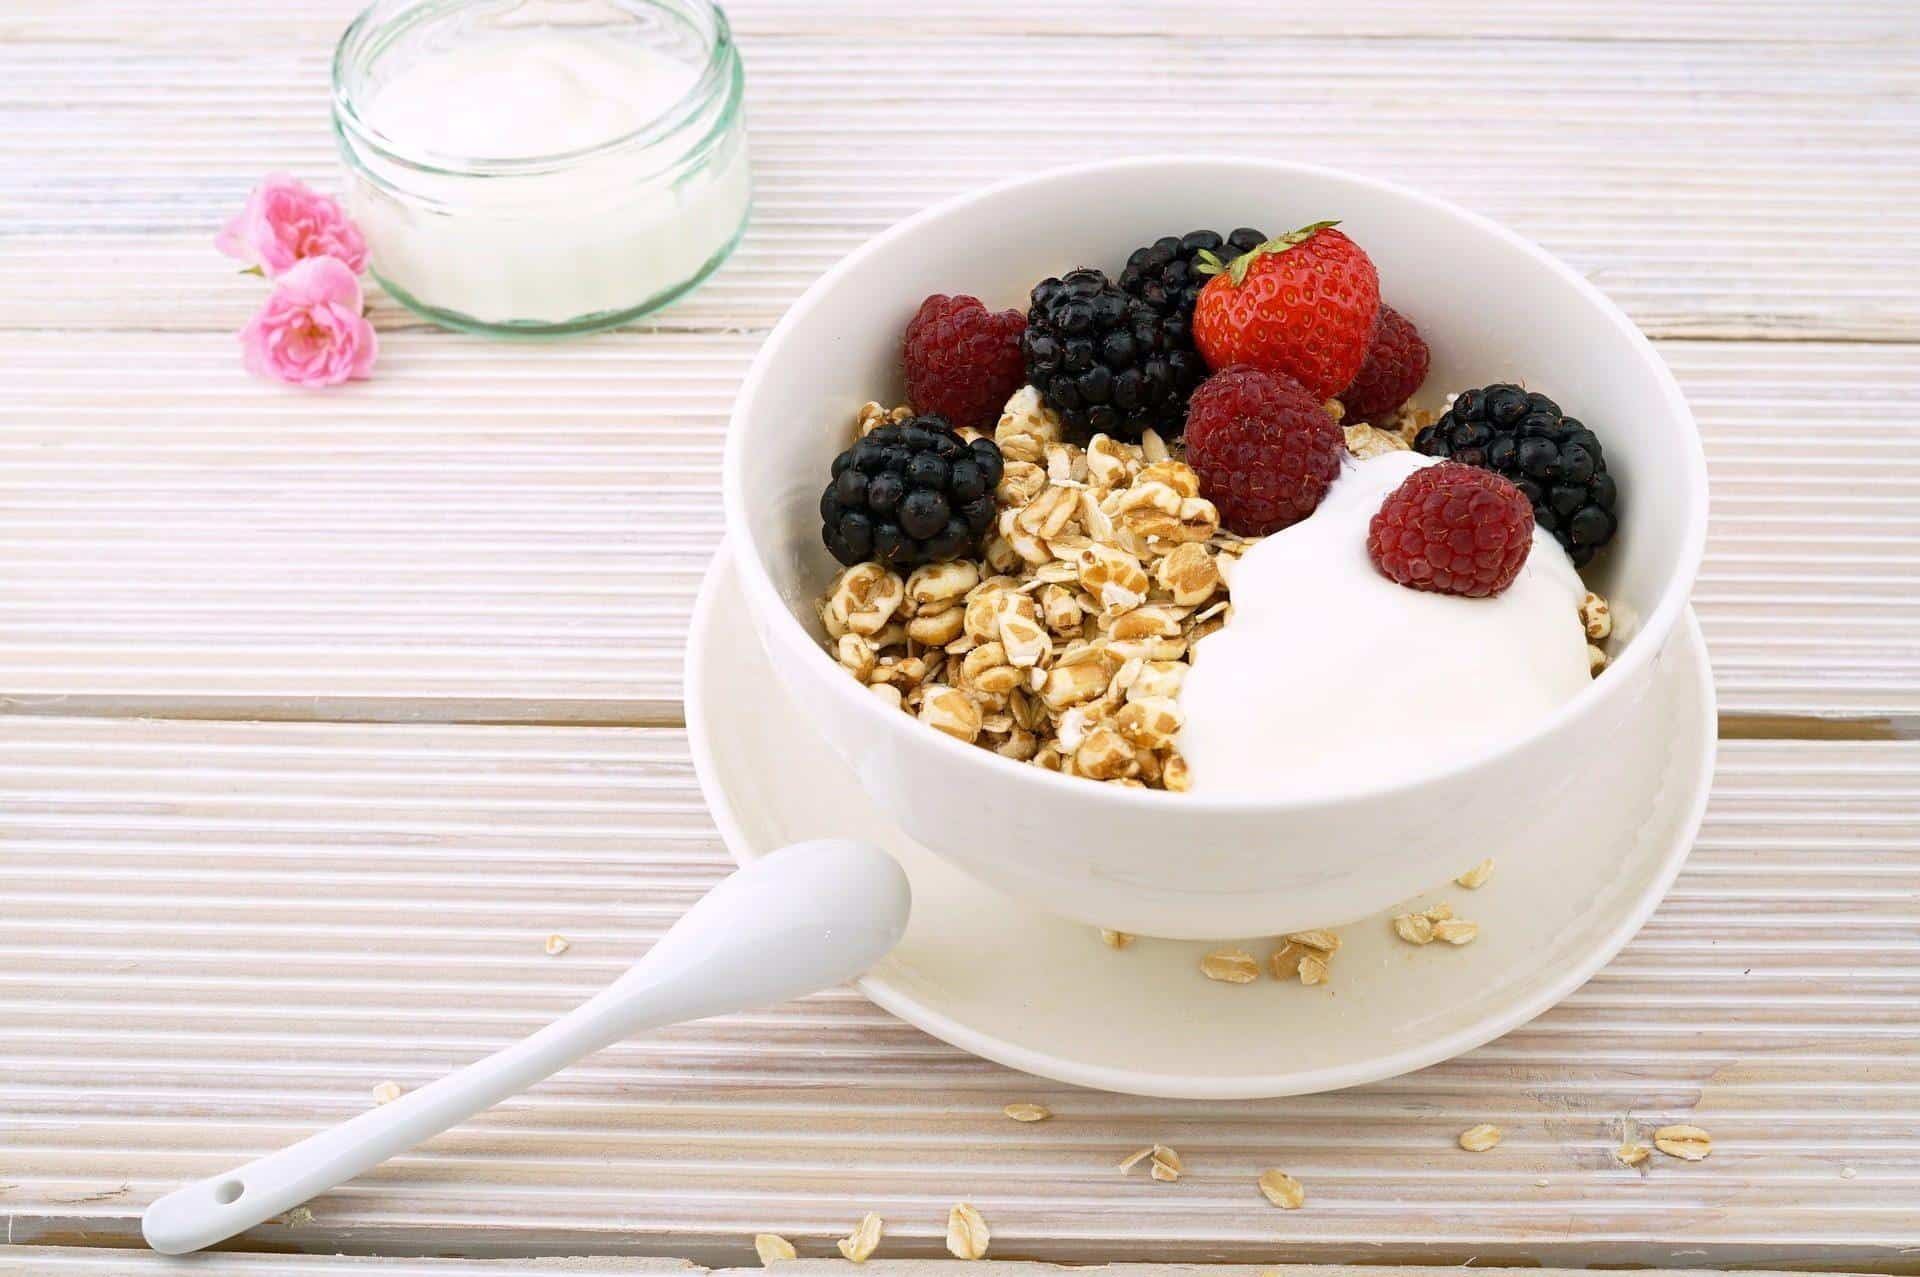 Yogurt with Berries and Muesli